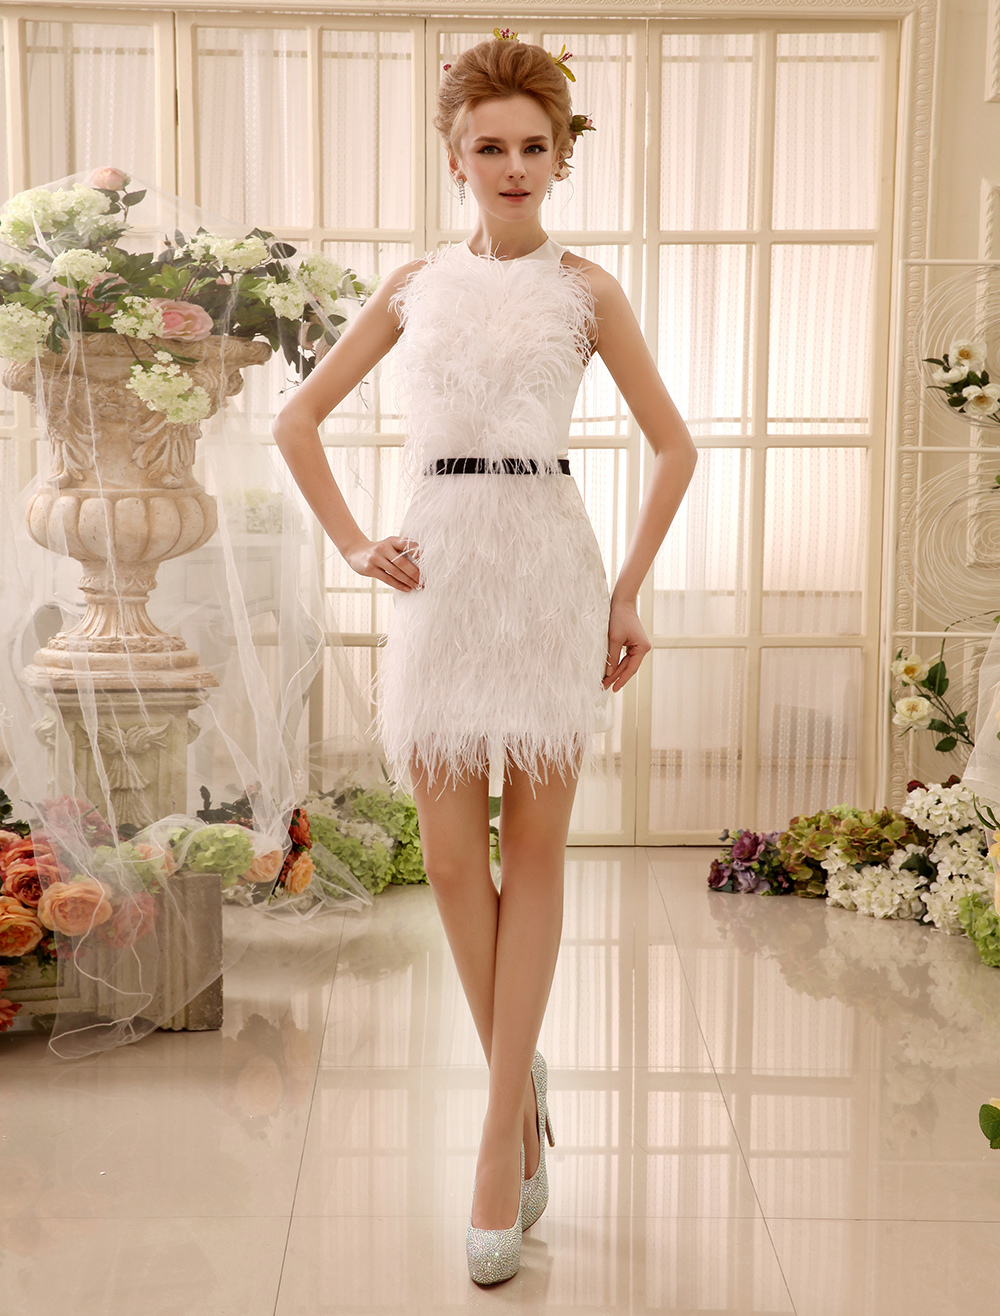 Feather Satin Ivory Bridal Short Wedding Dress with Sheath Jewel Neck Milanoo photo